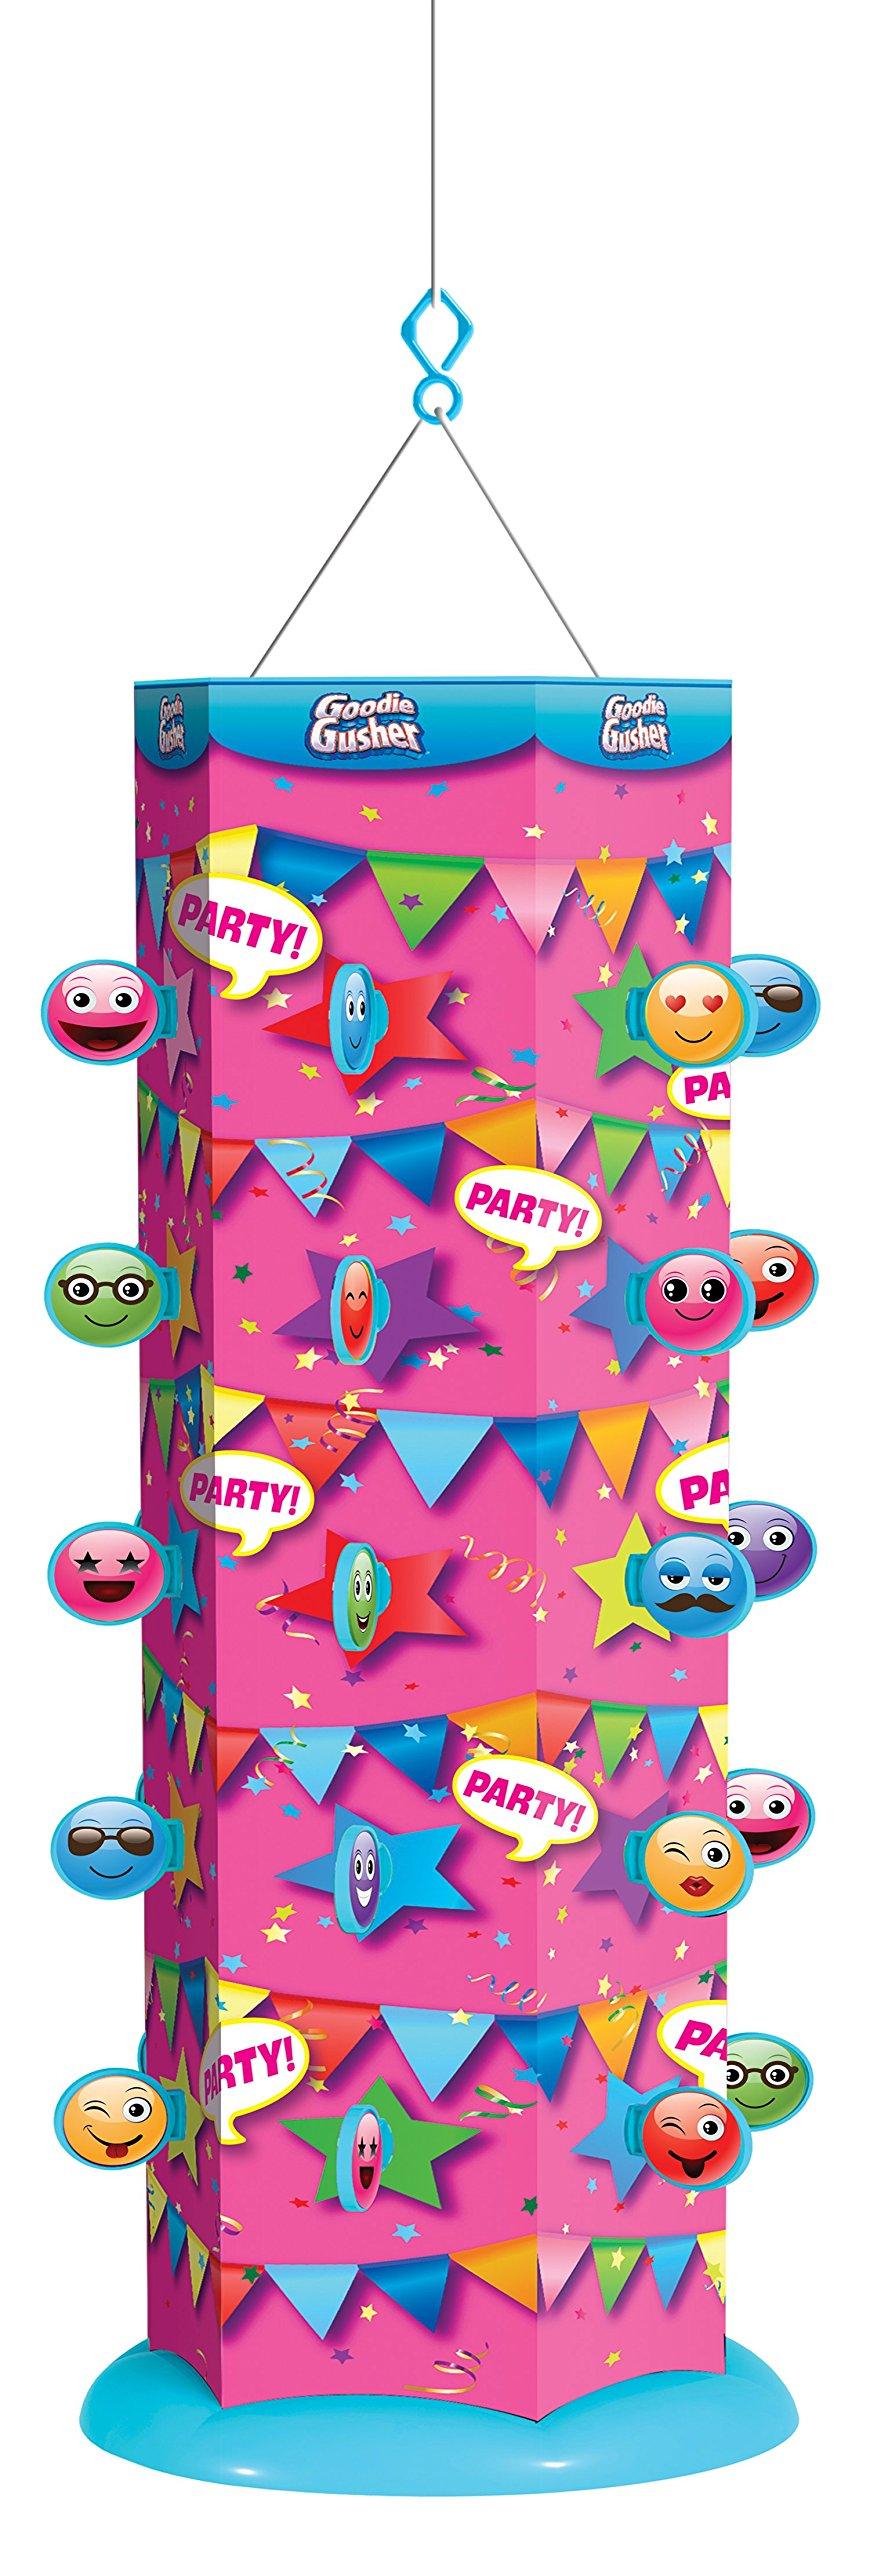 Goodie Gusher Reusable Party Piñata, Pixie Pink Emoticon